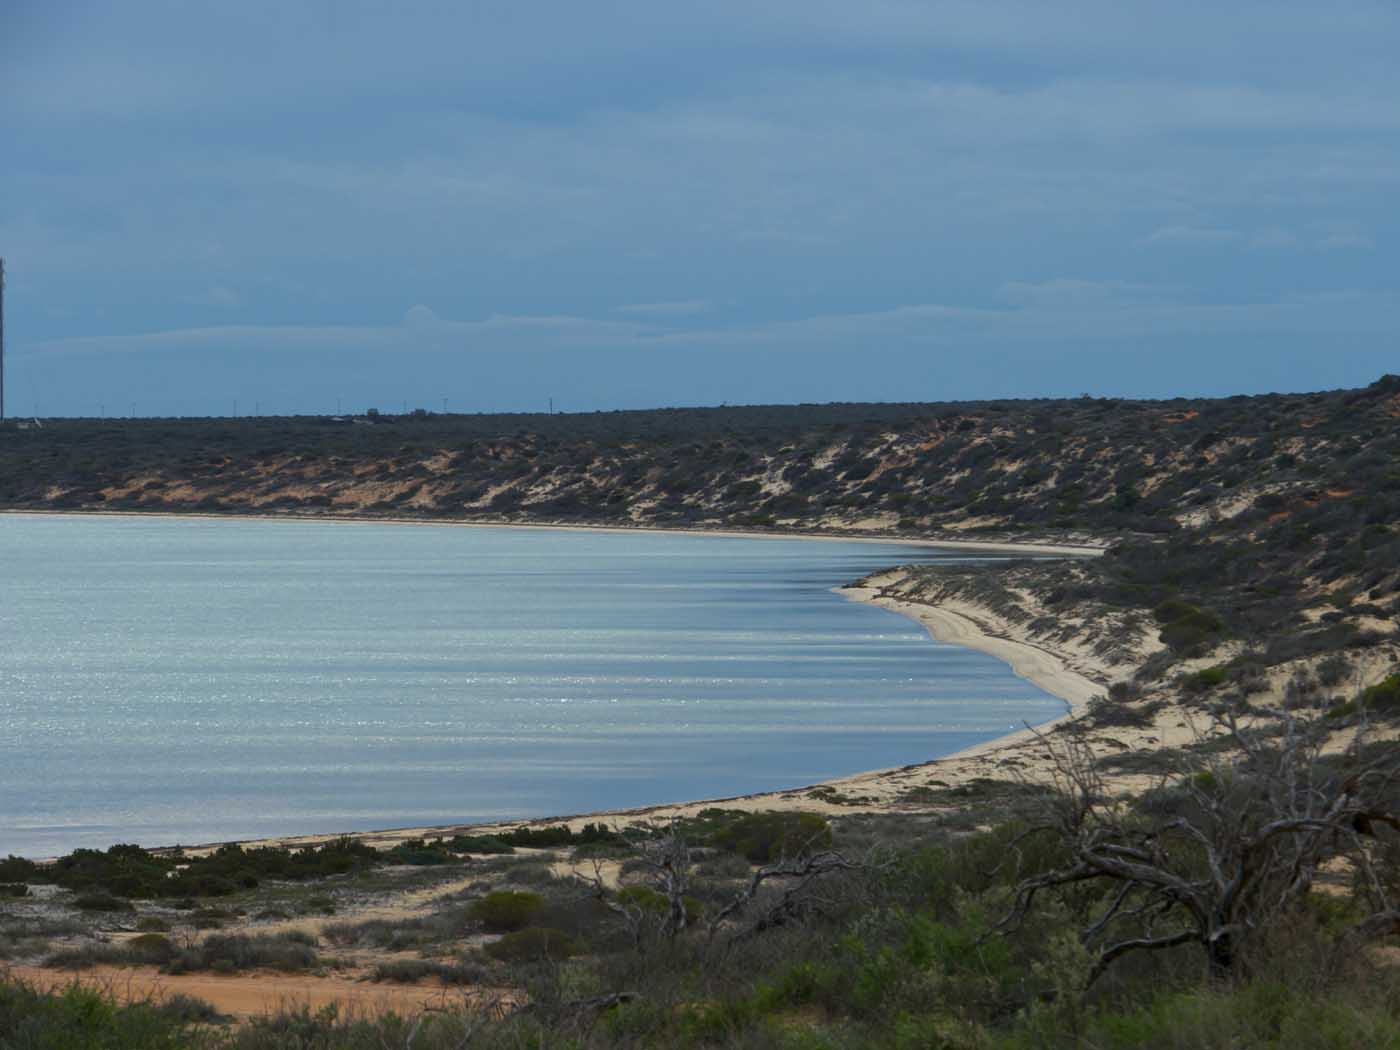 Denham Australia  City pictures : Denham Seaside Tourist Village, Western Australia | An adventure ...